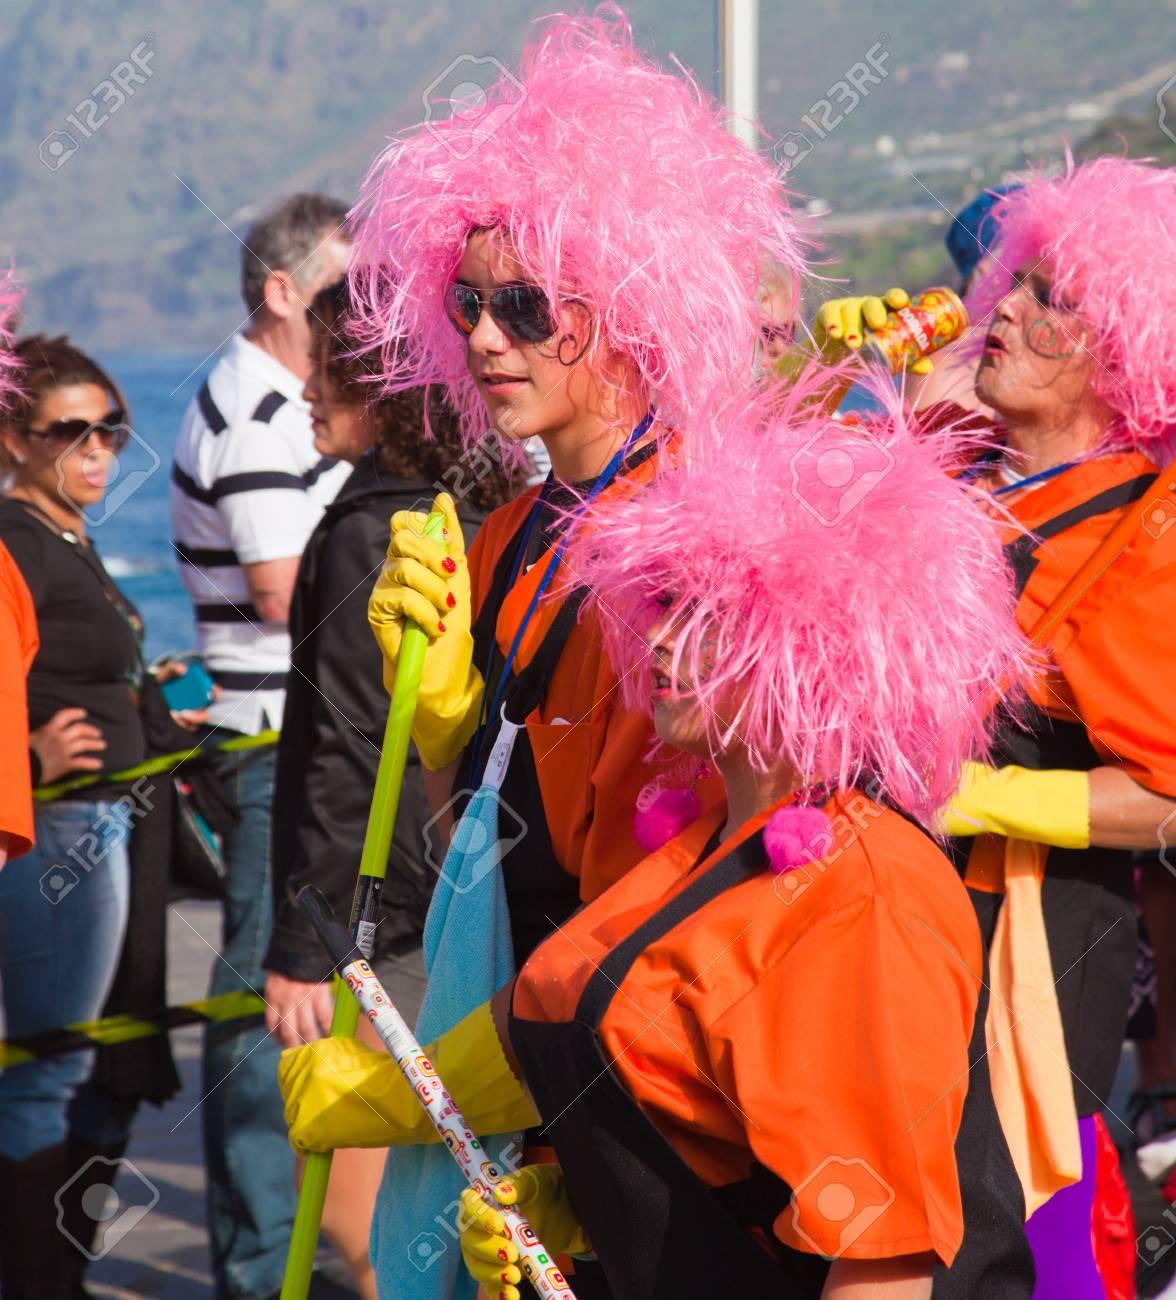 PUERTO DE LA CRUZ, SPAIN - February 16: Colorfully dressed participants take part in main carnival parade on February 16, 2013 in Puerto de la Cruz, Tenerife, Spain Stock Photo - 18509406